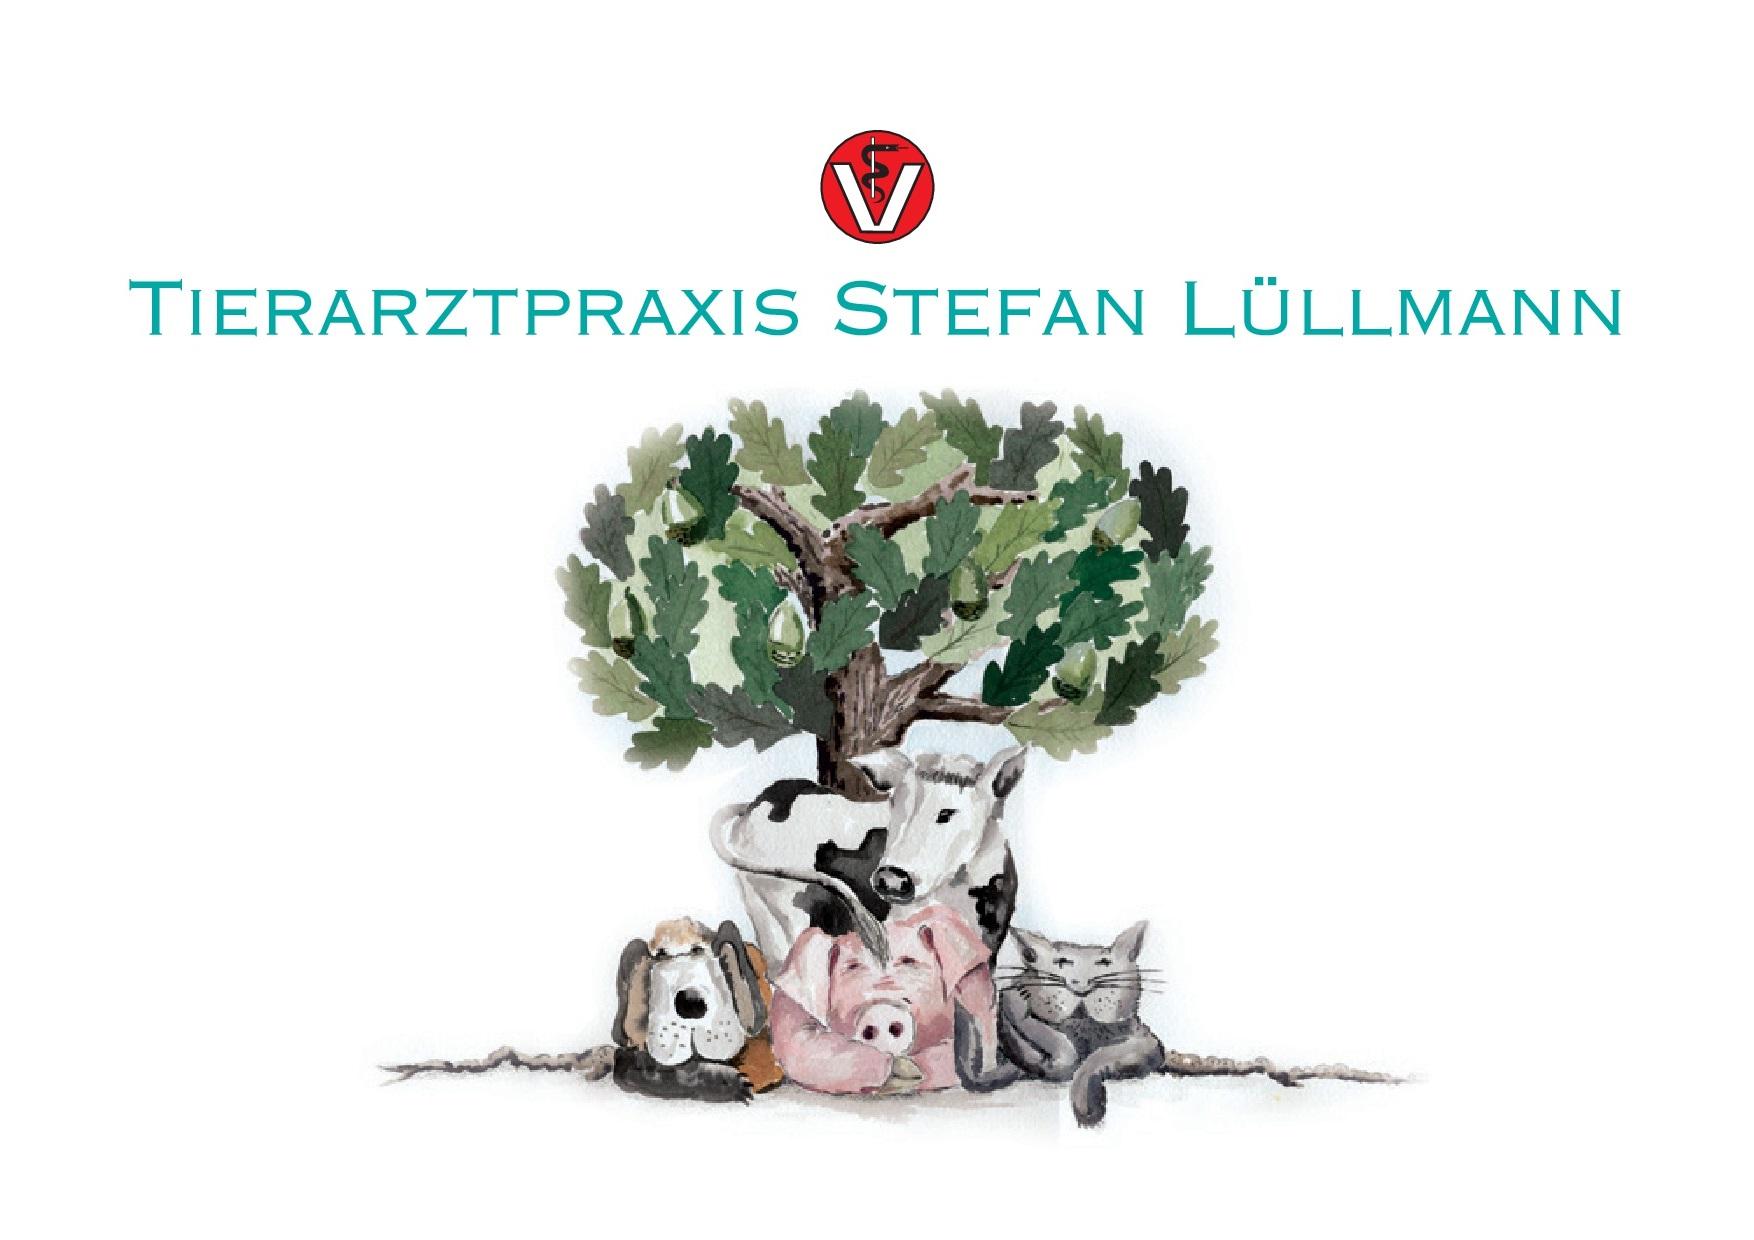 zum Bild:<br>Logo Tierarztpraxis Stefan Lüllmann